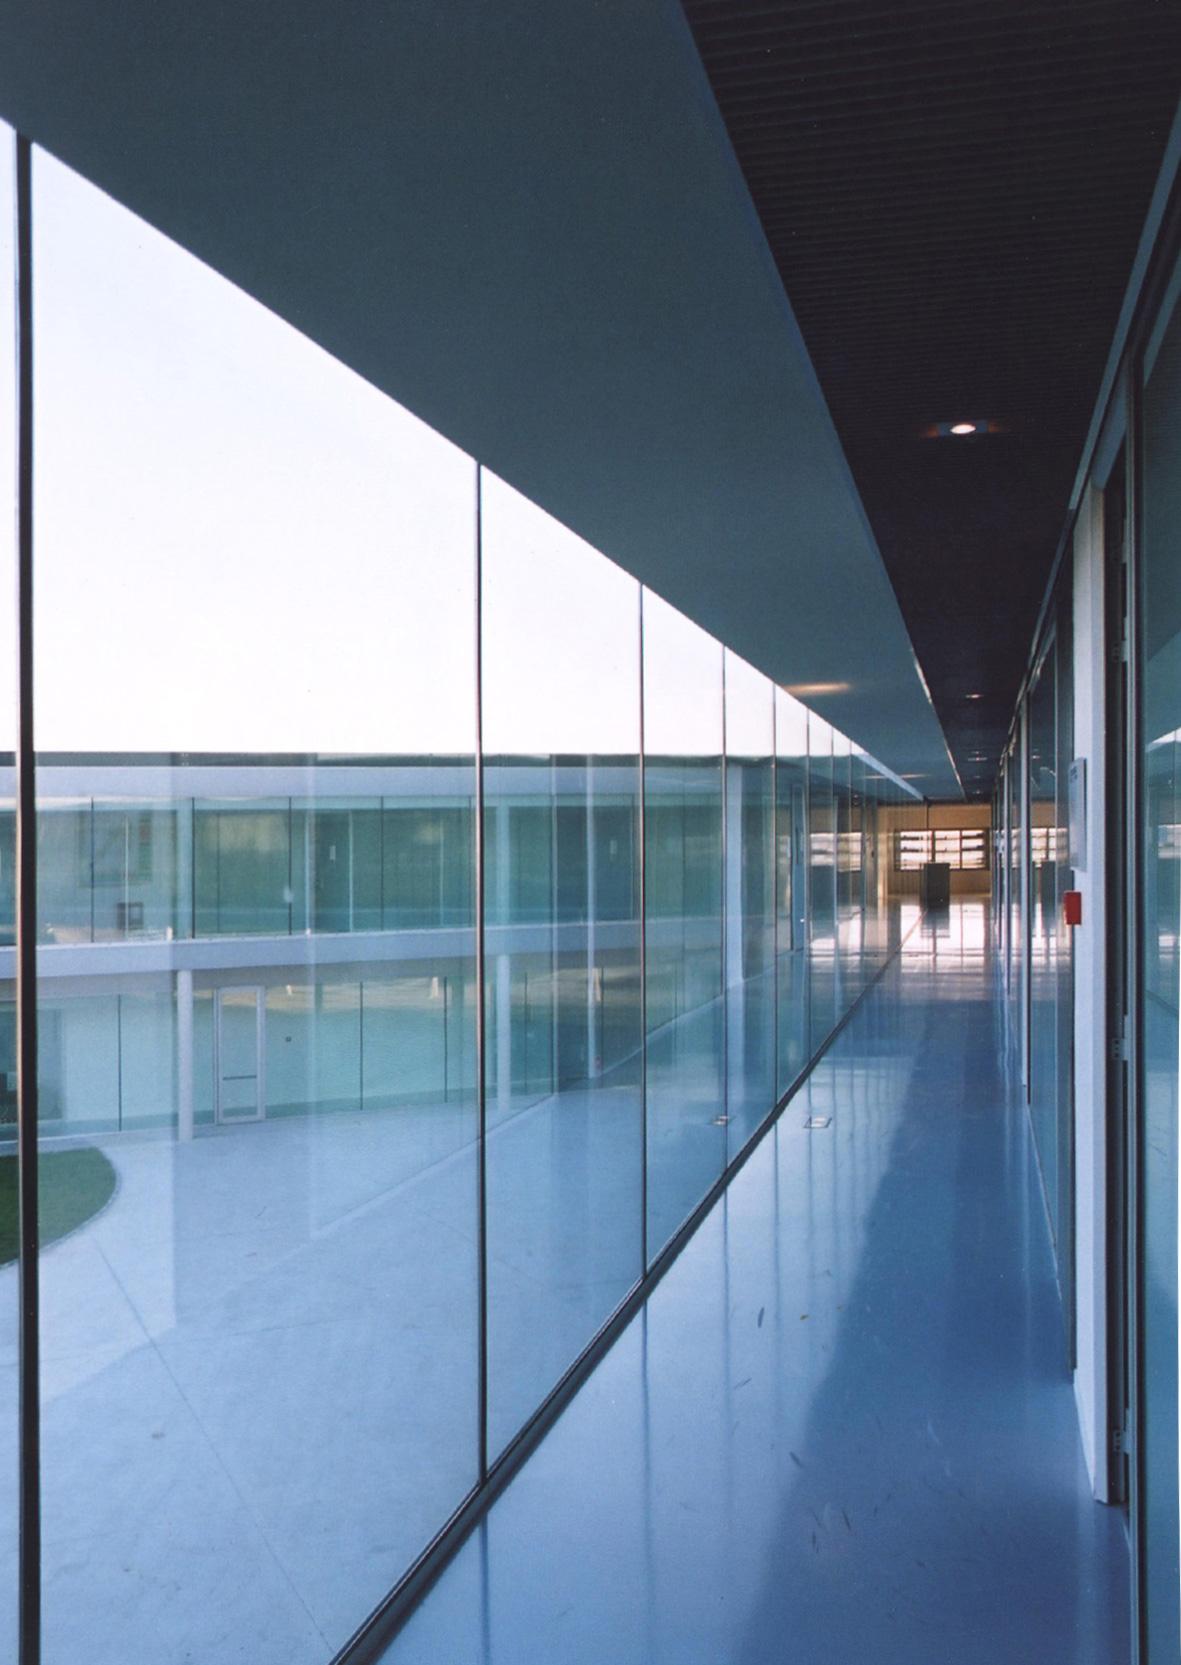 colomes-nomdedeu-hotel-entreprises-3